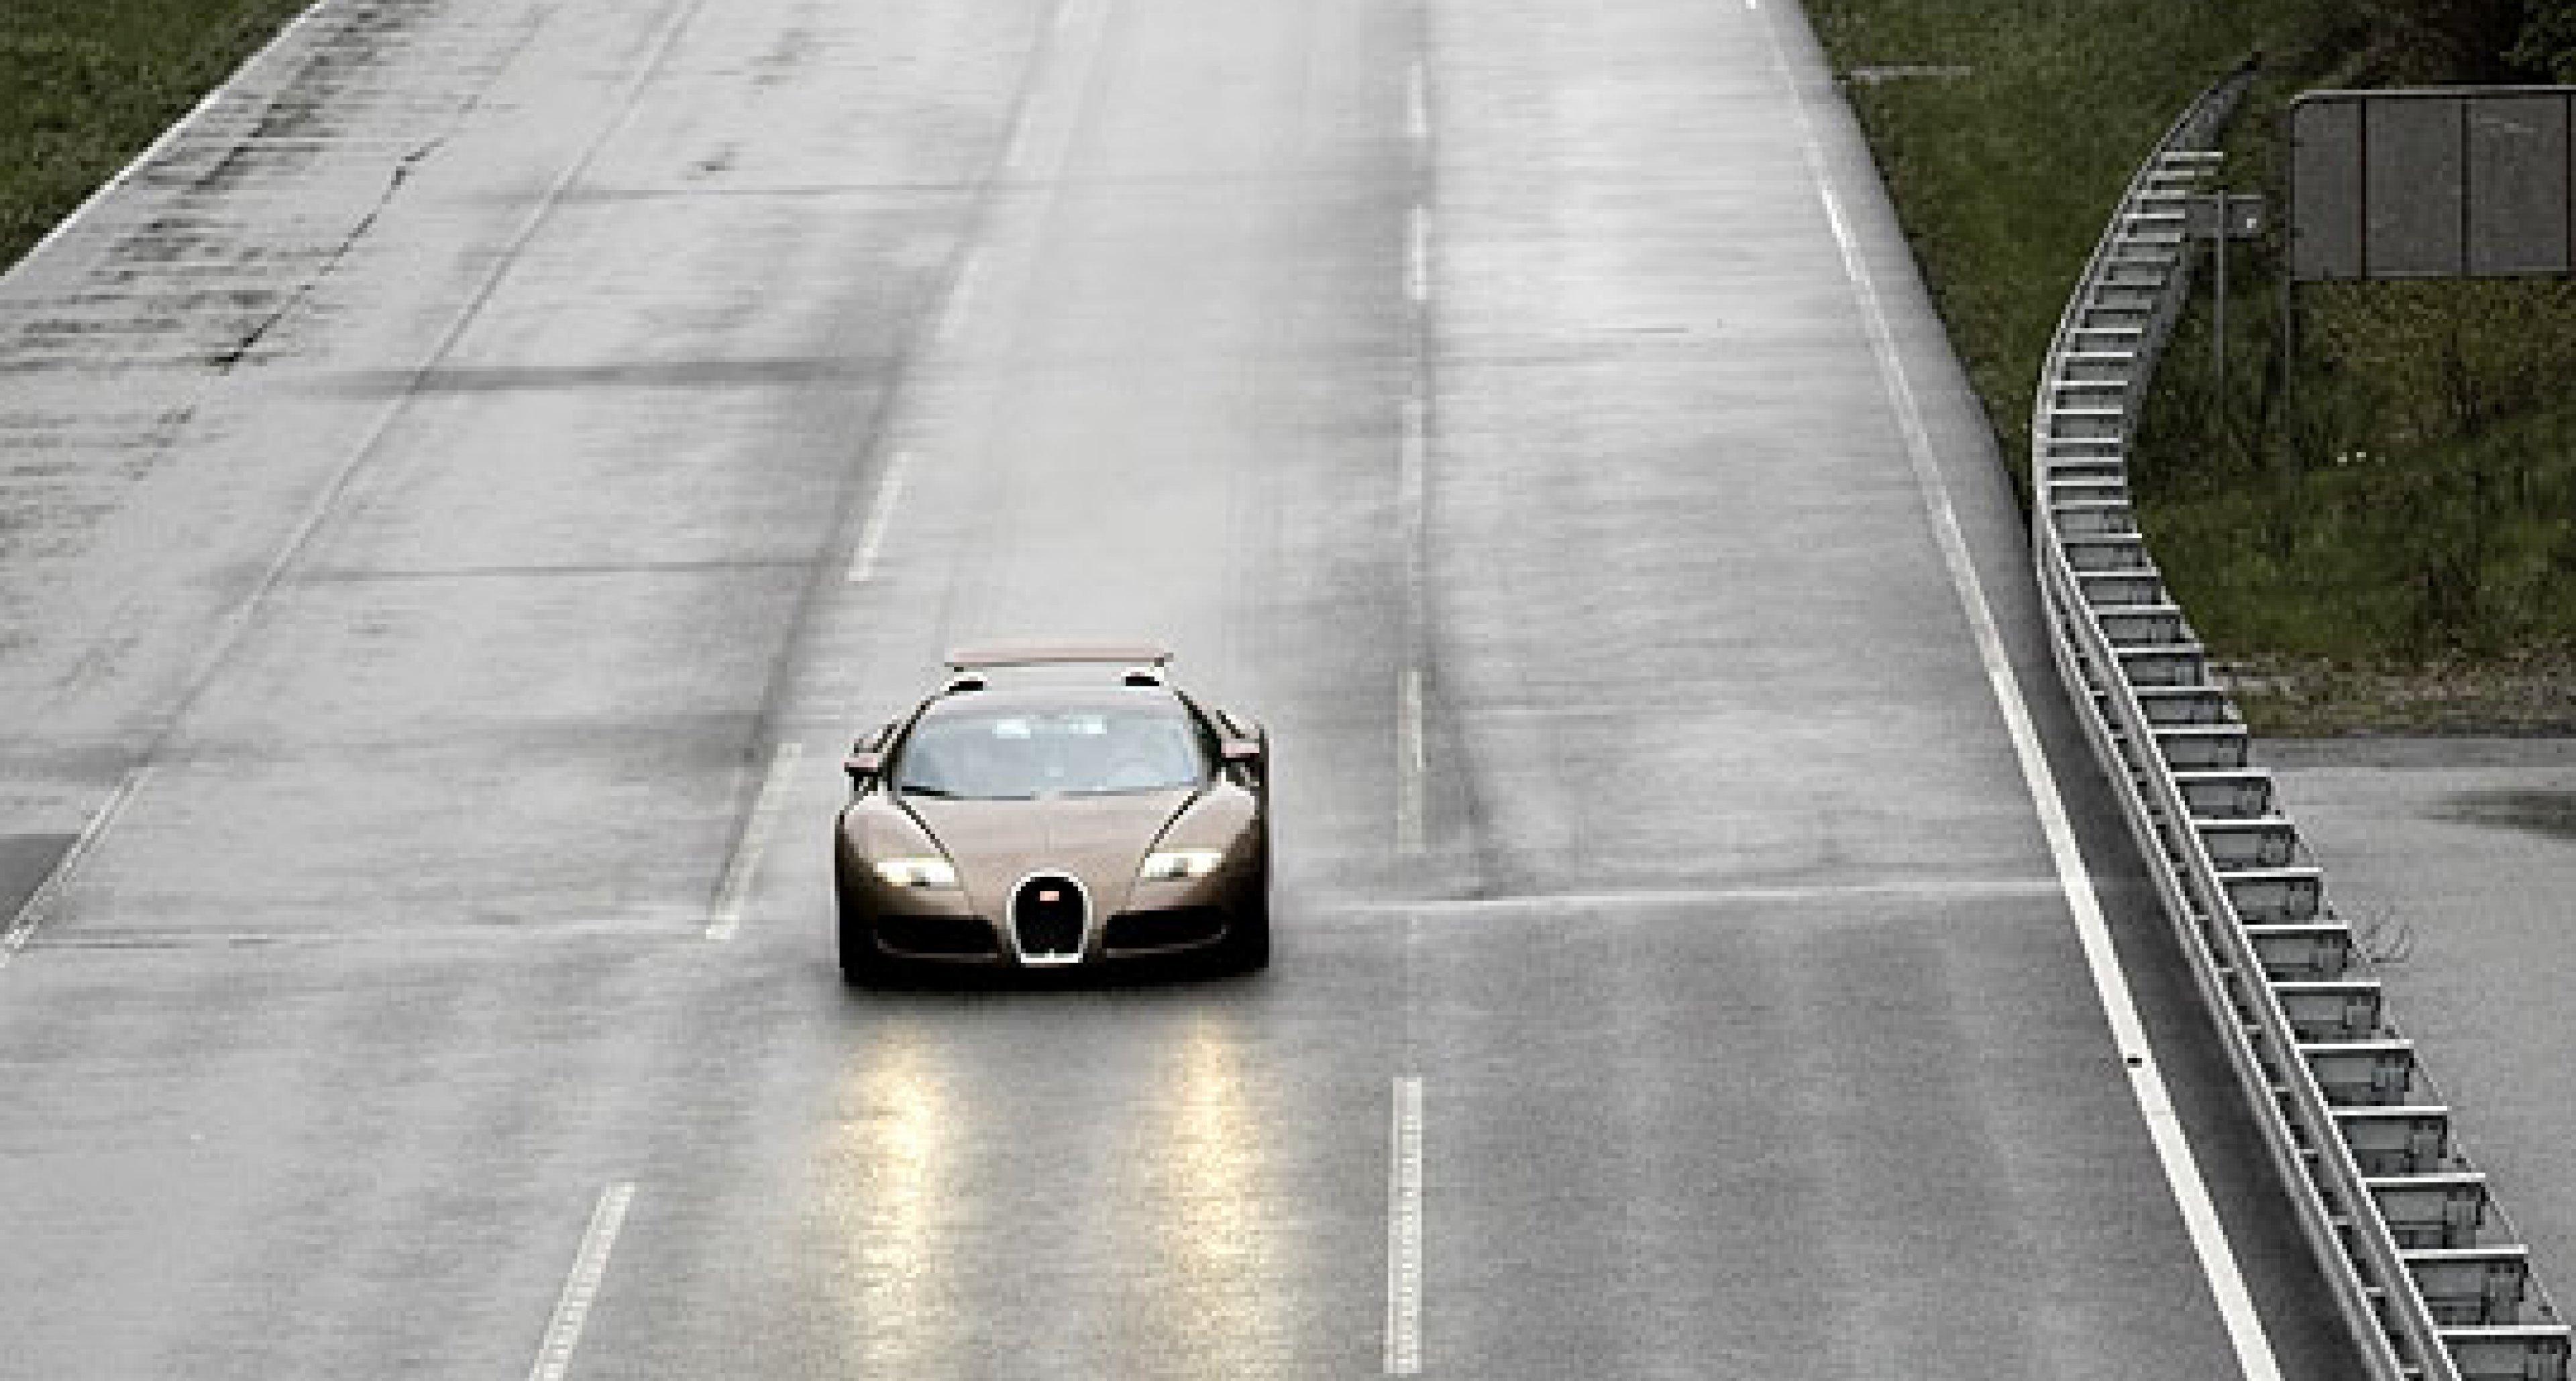 Bugatti Veyron at Top Speed